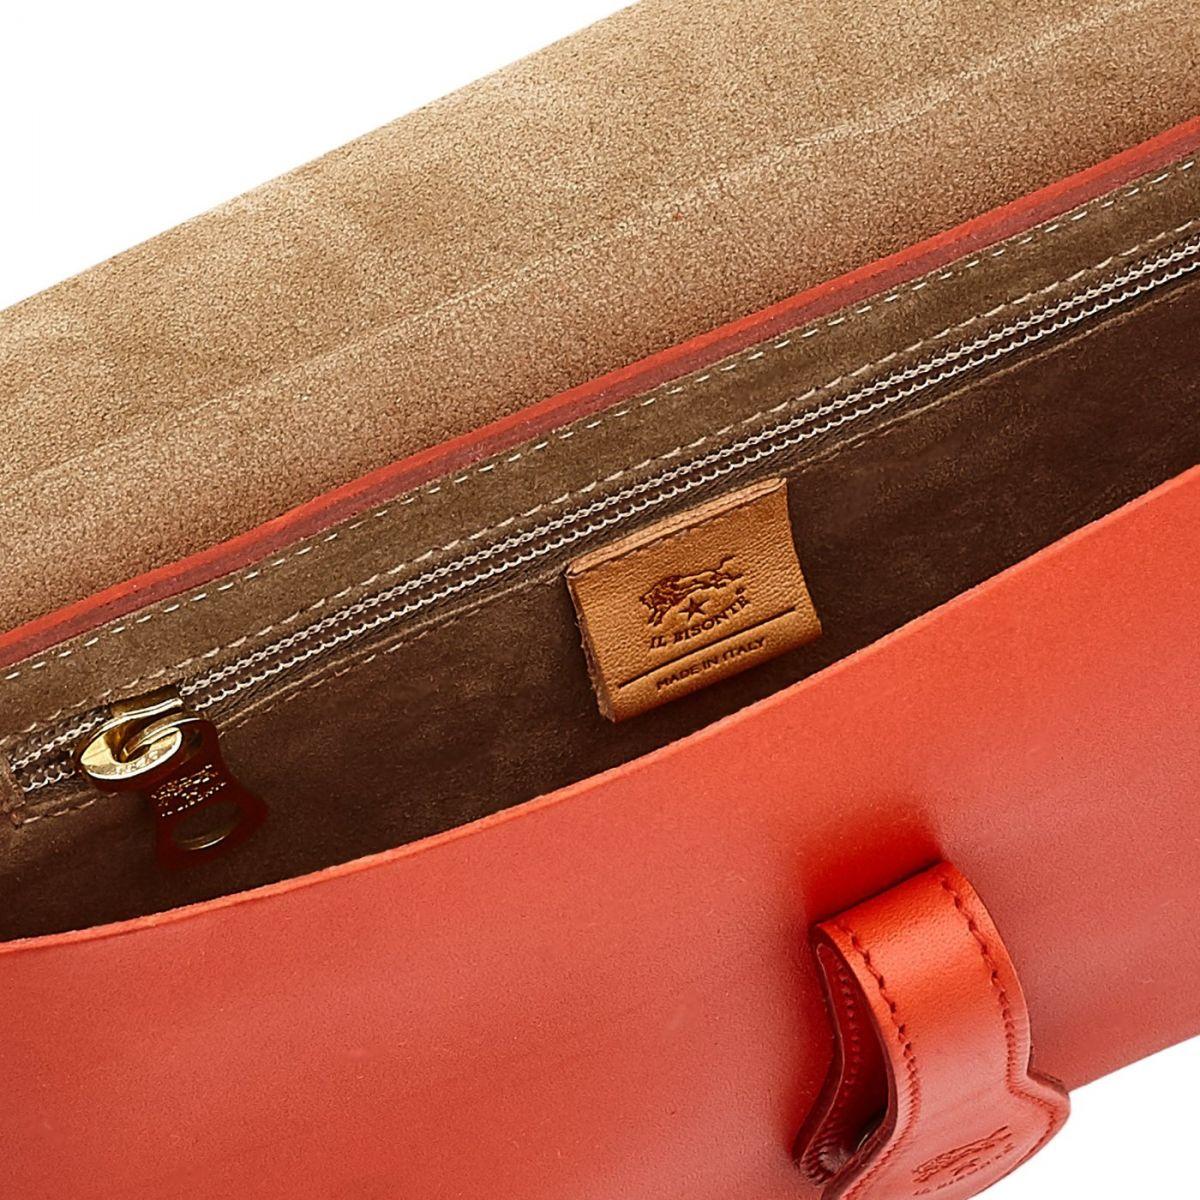 Women's Shoulder Bag Salina in Cowhide Leather BSH085 color Gazpacho | Details